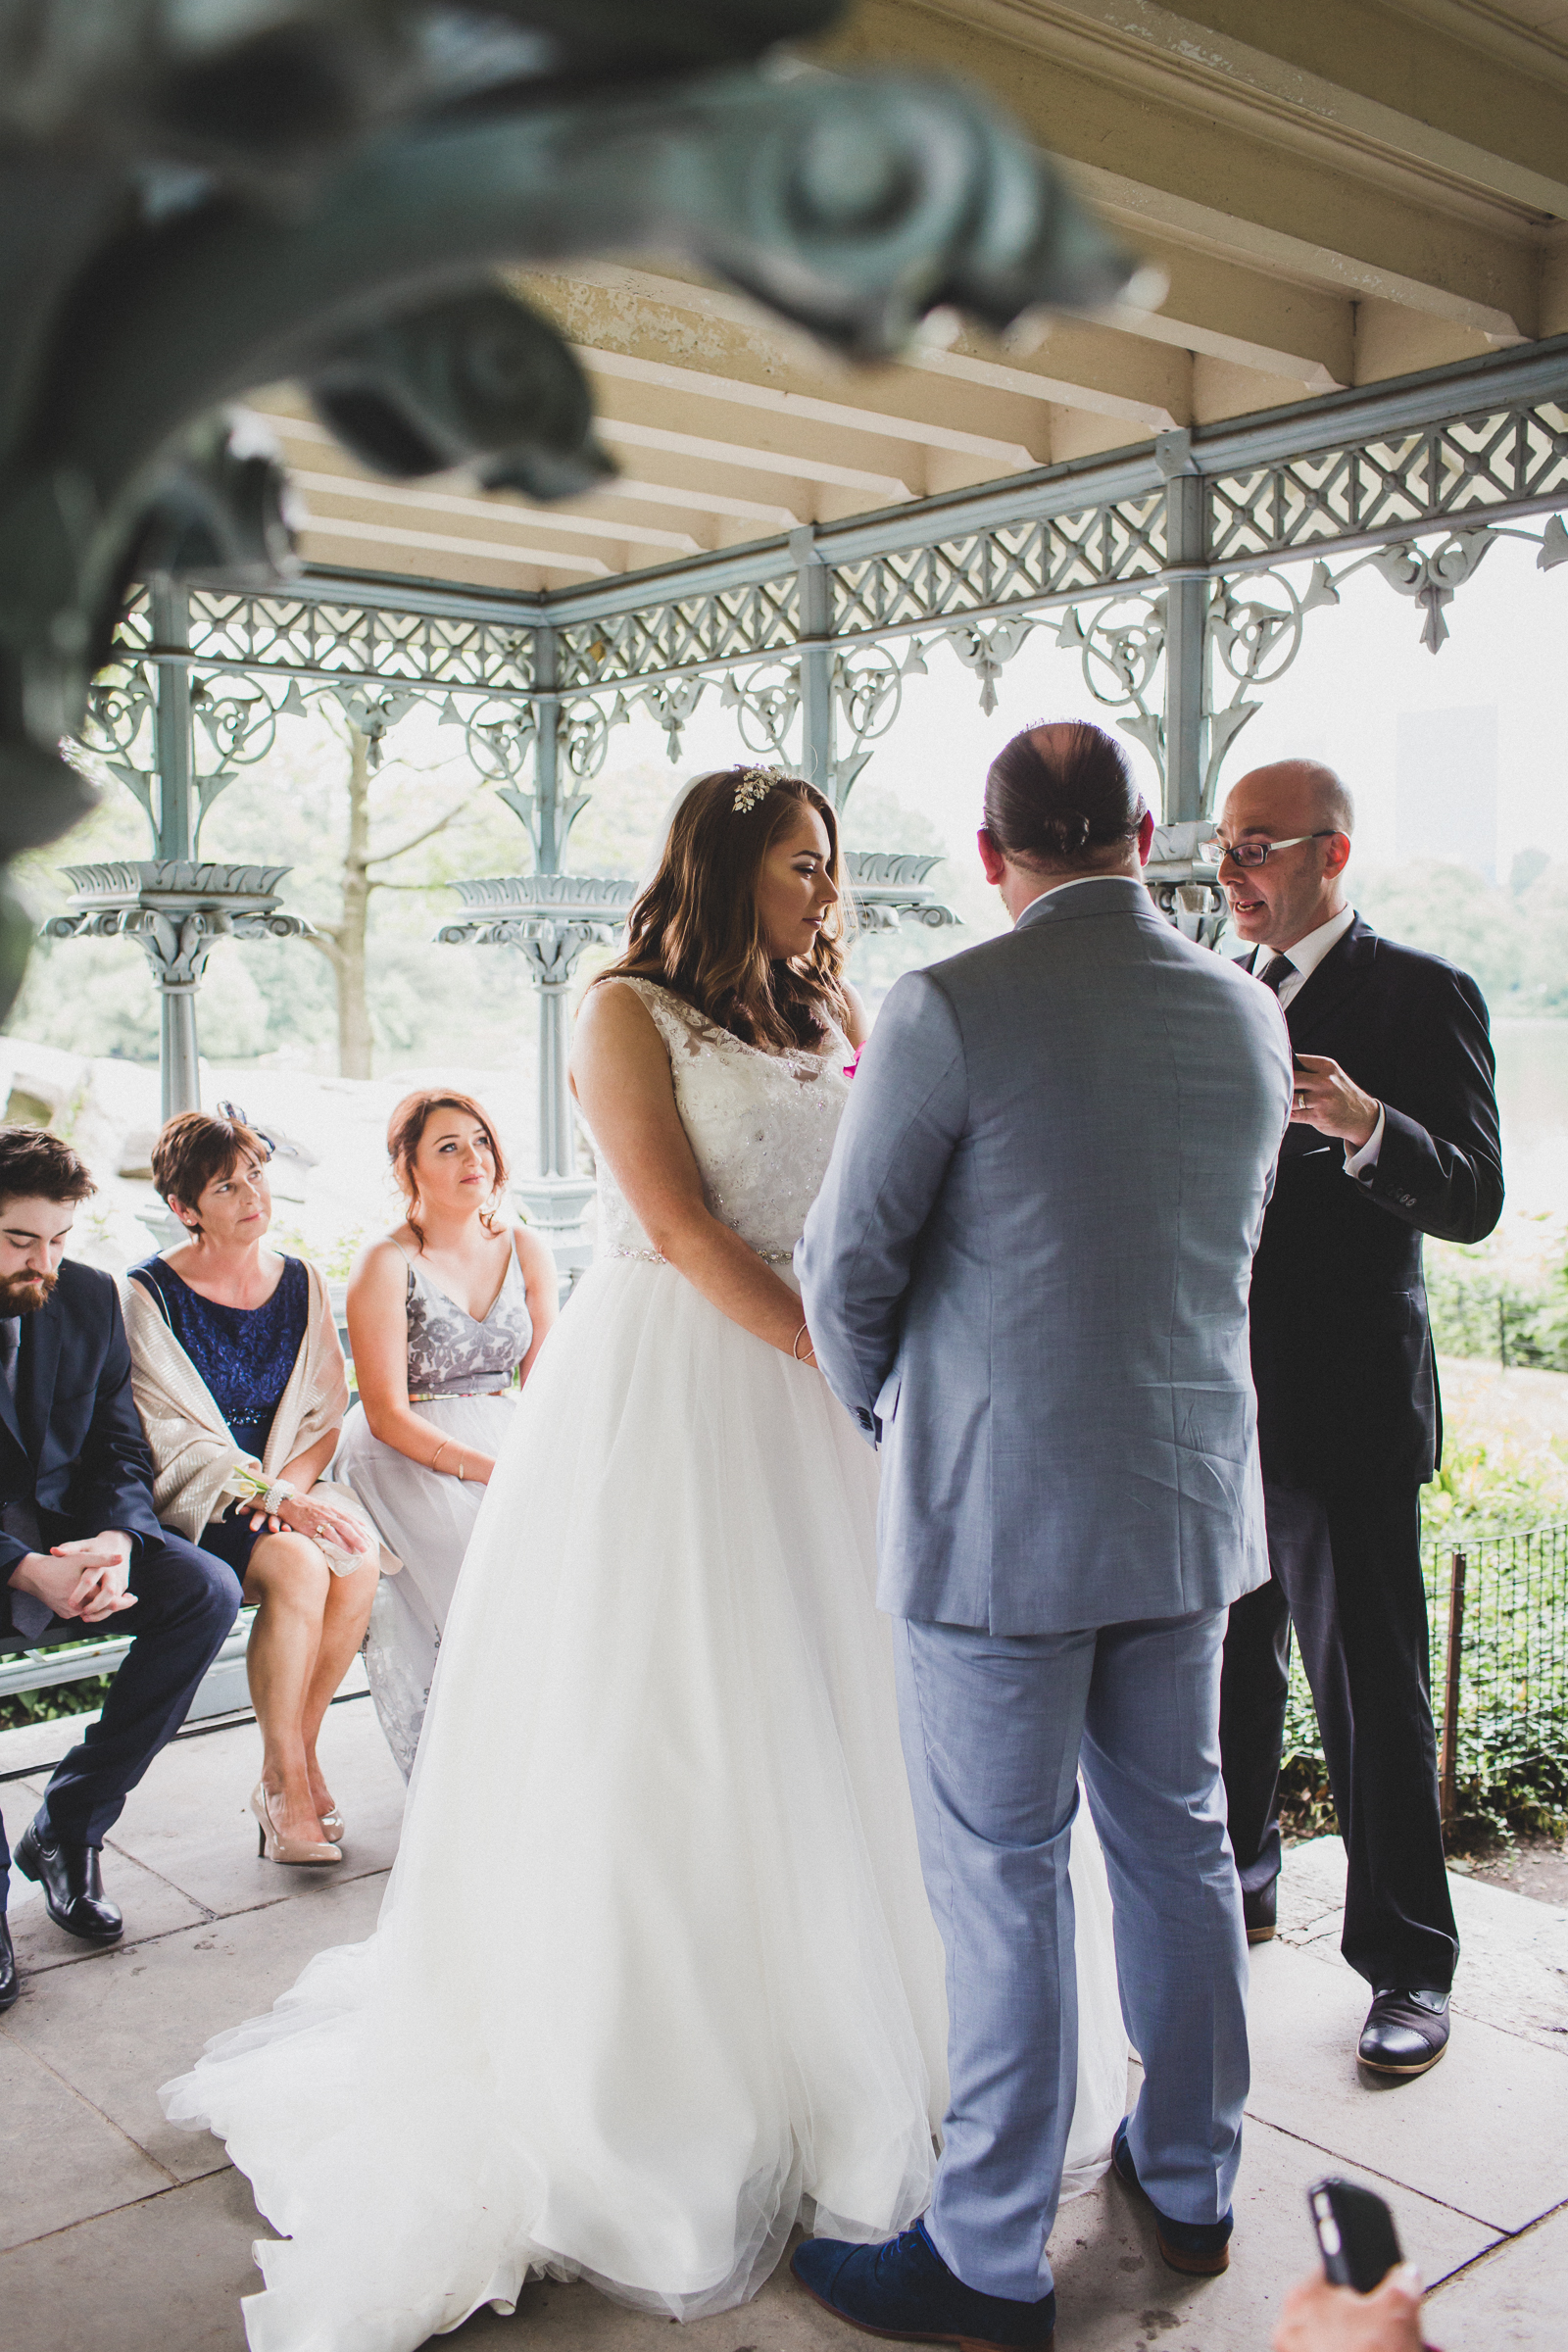 NYC-Central-Park-Elopement-New-York-Documentary-Wedding-Photographer-Dumbo-Brooklyn-Bridge-Park--17.jpg